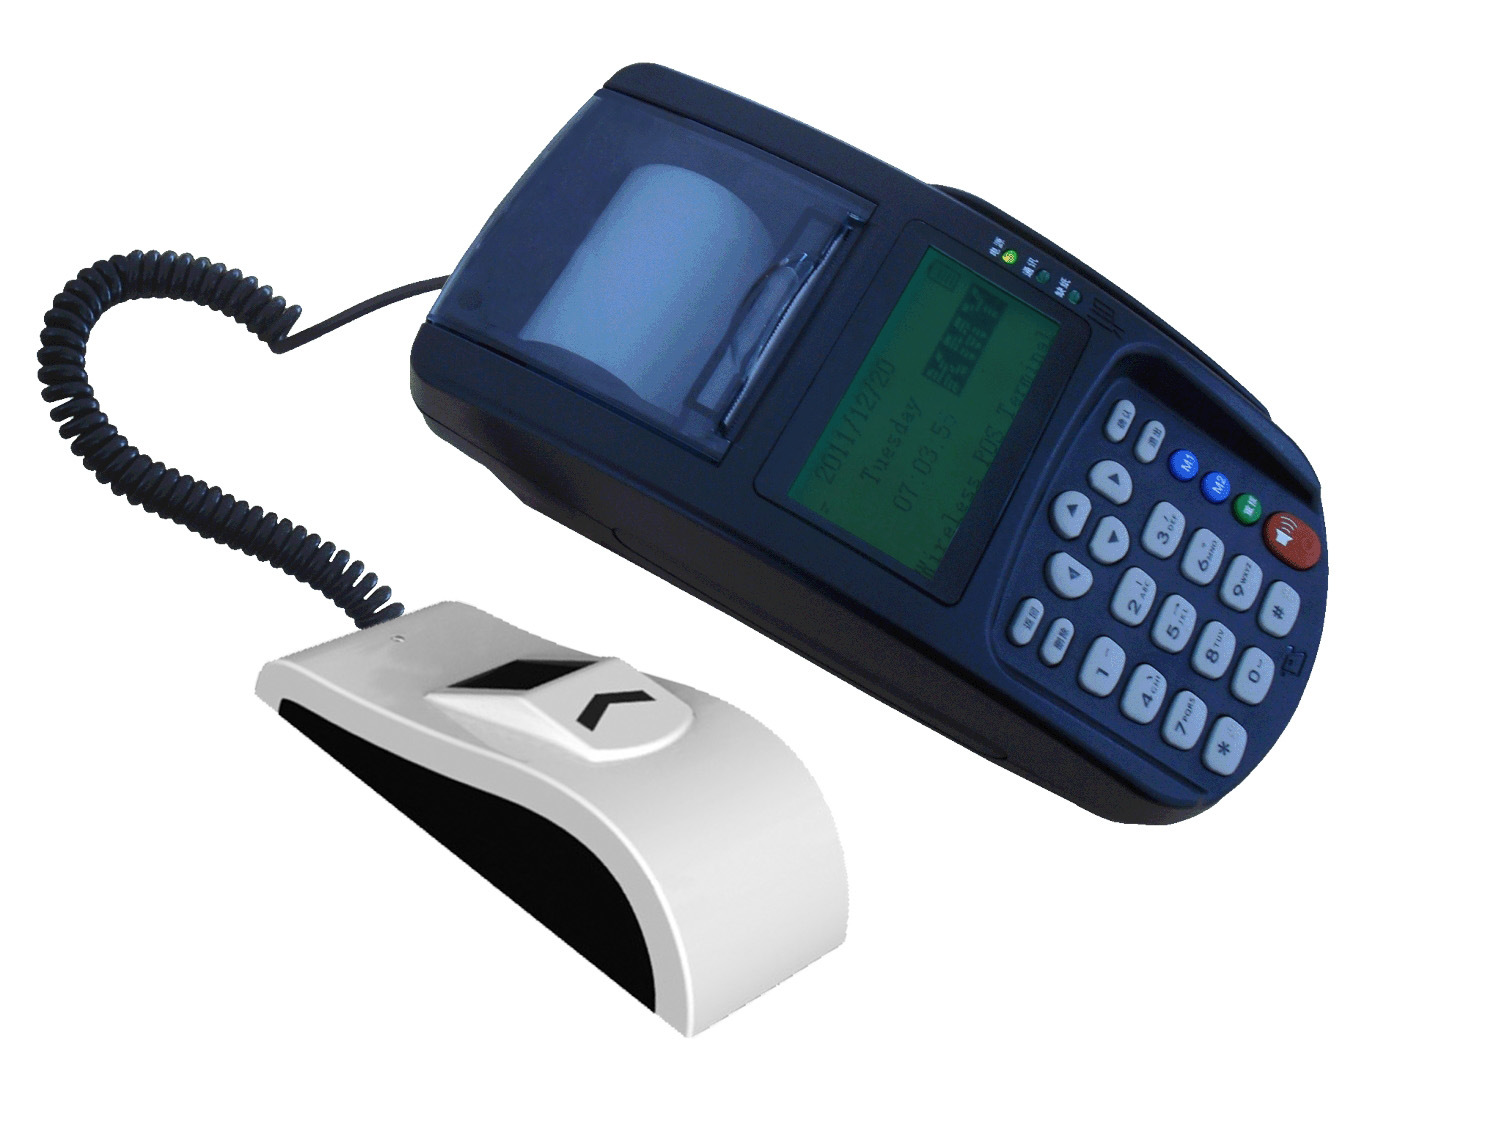 GSM/GPRS POS With Fingerprint Reader